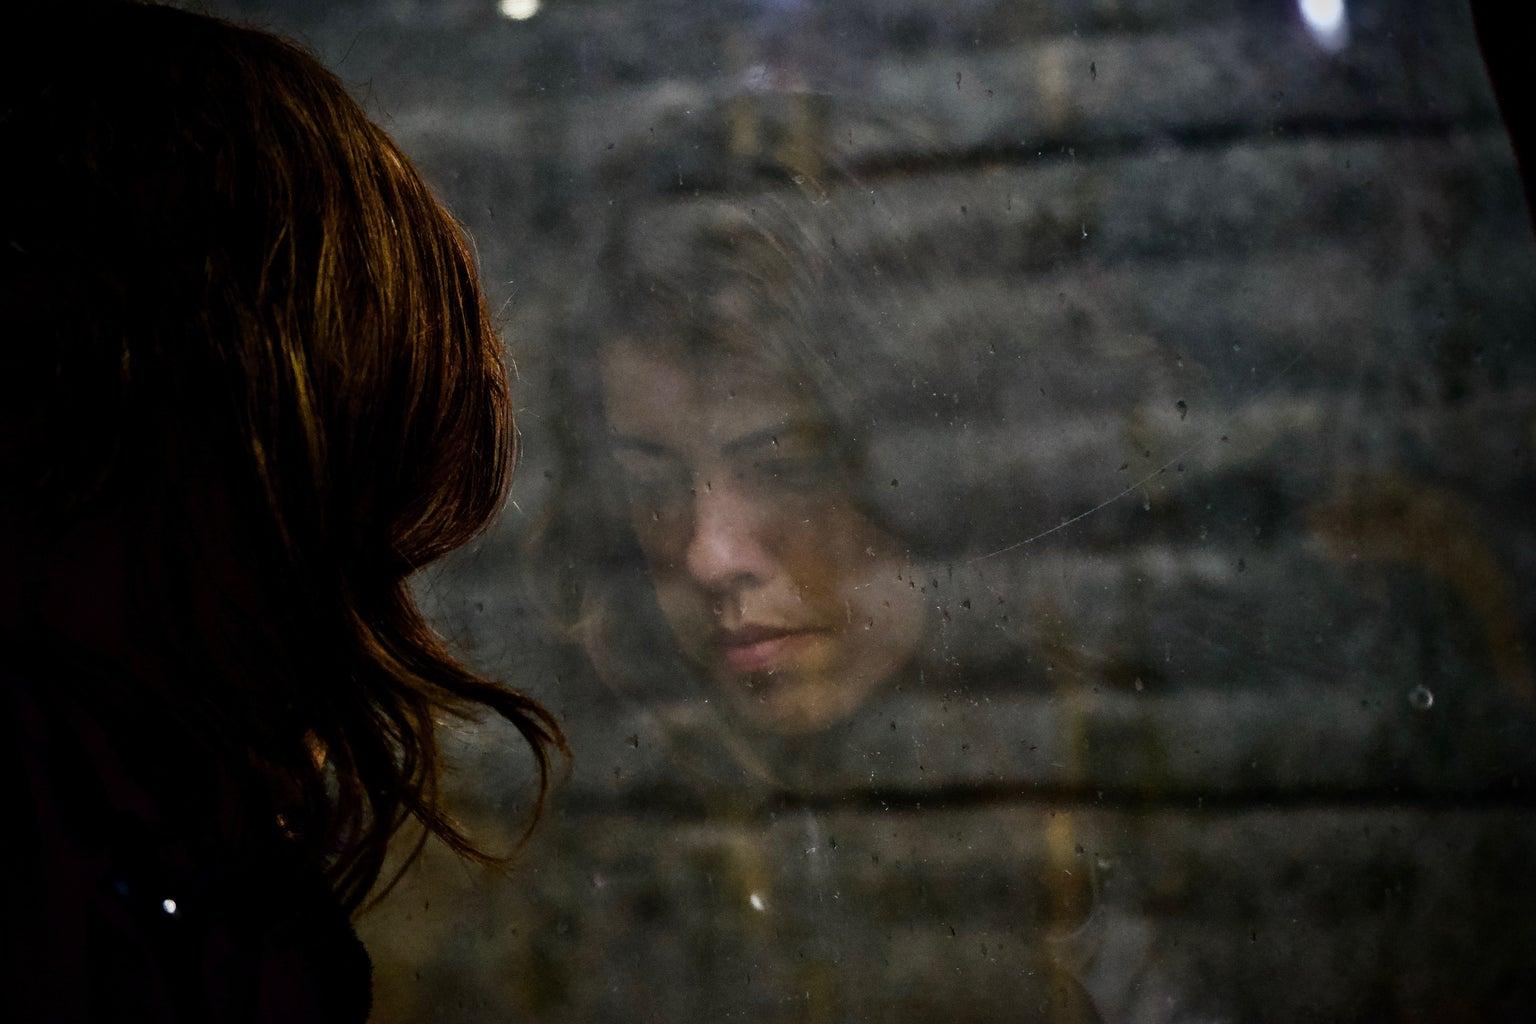 Woman staring at a window sadly